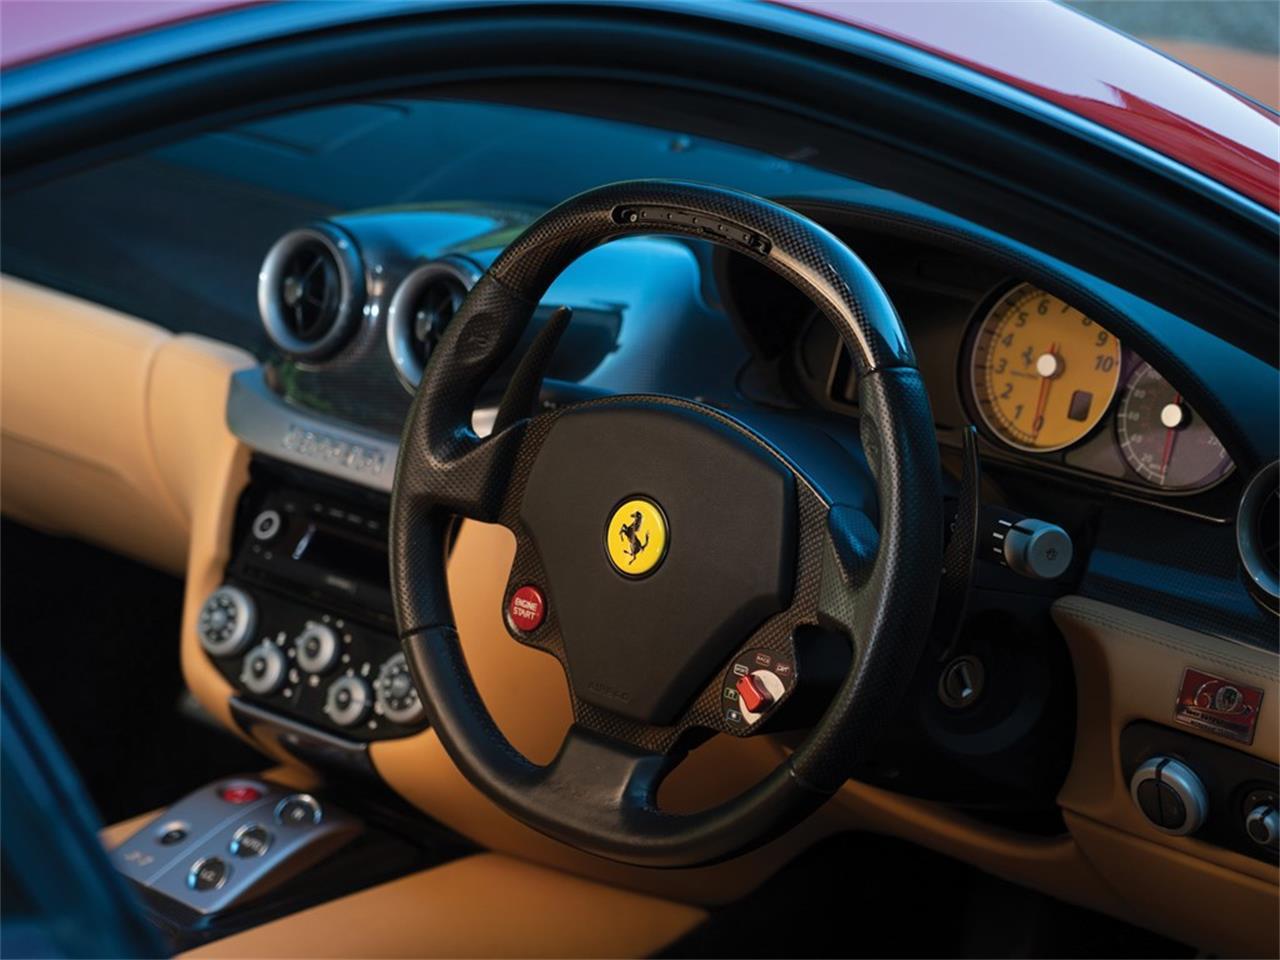 2007 Ferrari 599 GTB (CC-1273467) for sale in Hammersmith, London